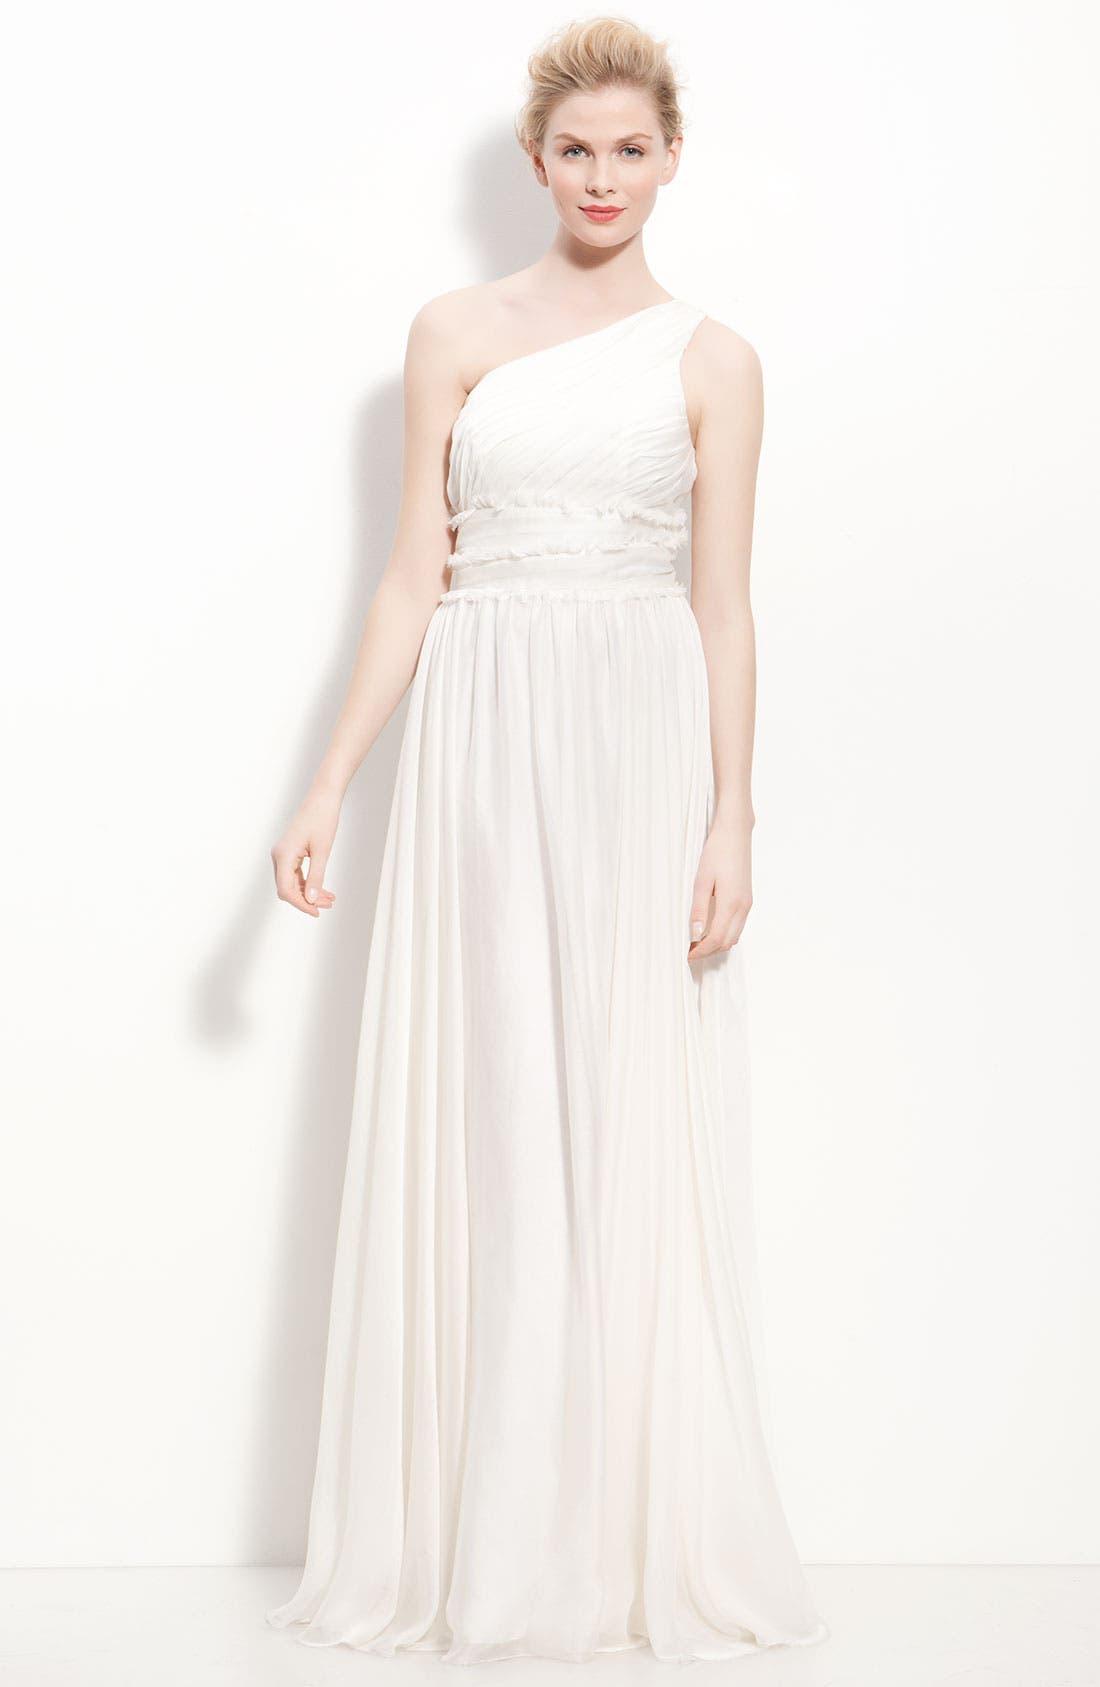 Alternate Image 1 Selected - ML Monique Lhuillier Bridesmaids One-Shoulder Chiffon Gown (Nordstrom Exclusive)